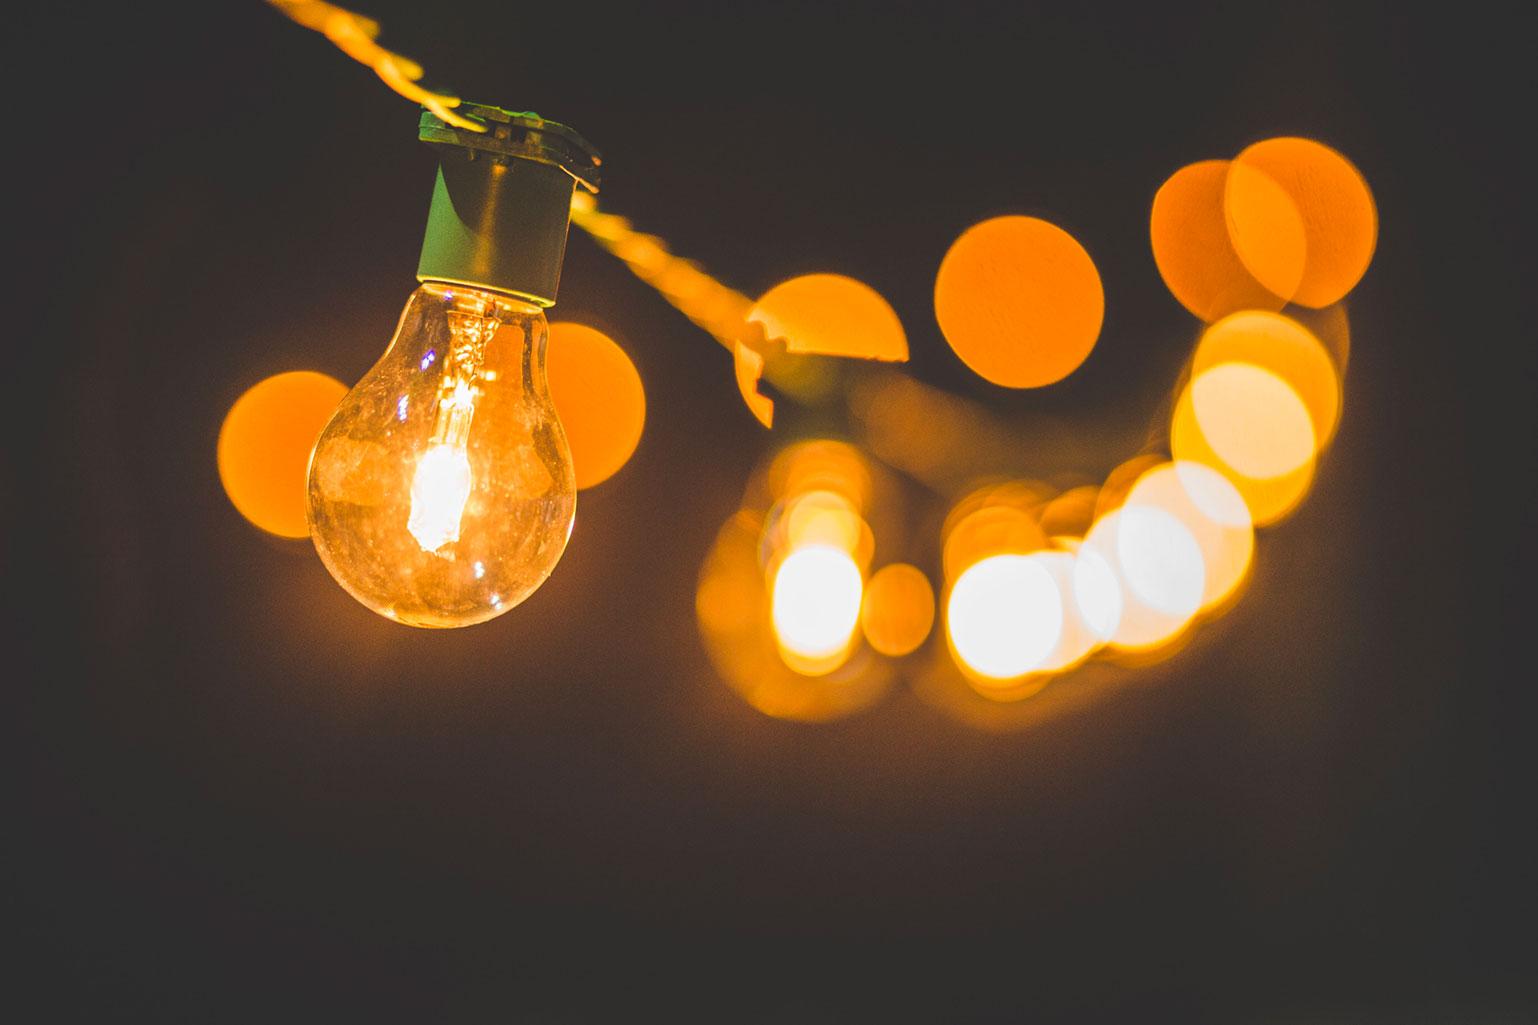 string of light bulbs in dark